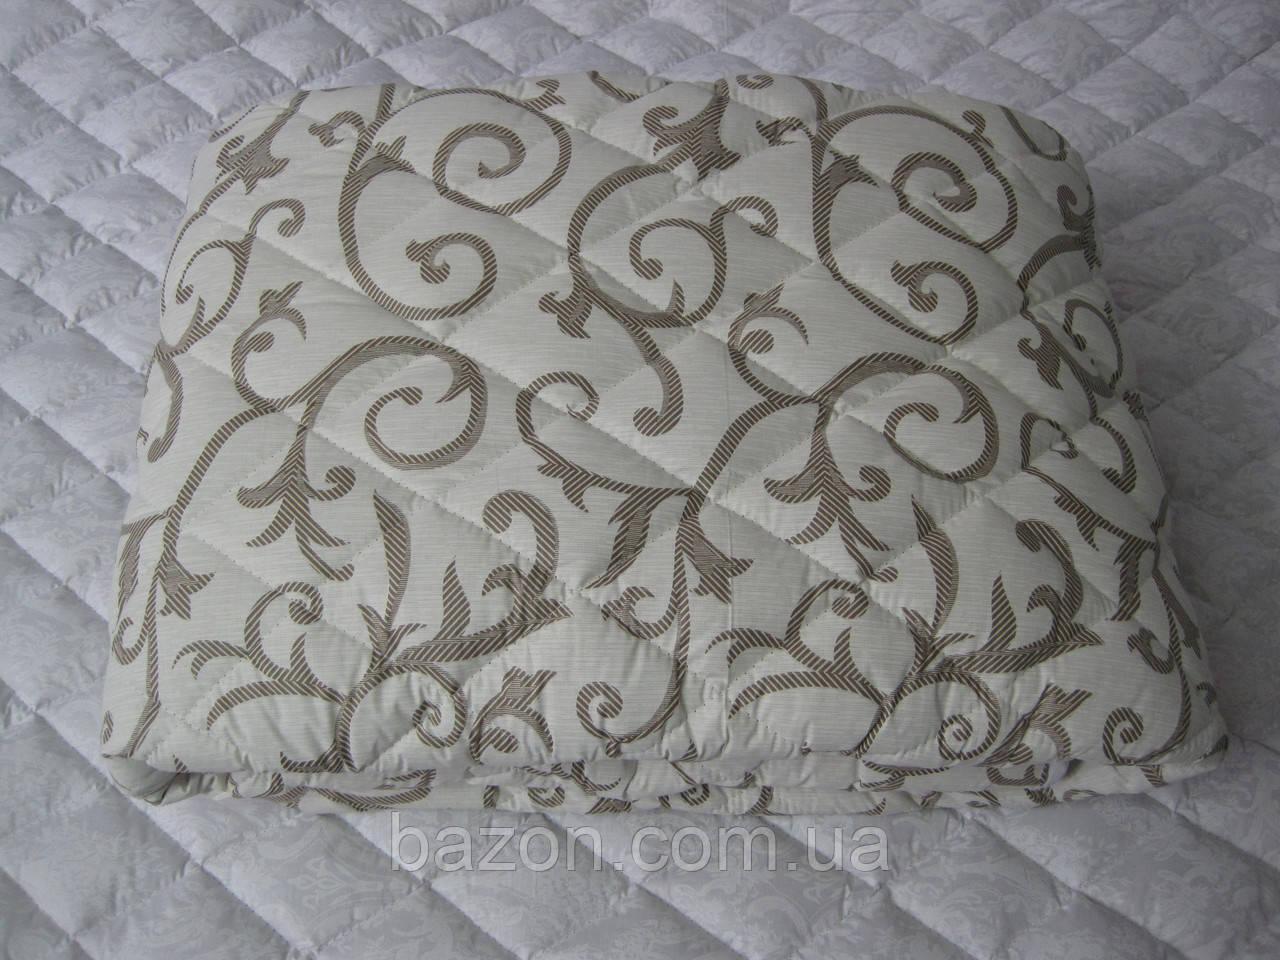 Одеяло полуторное 150х210 см хлопок силикон TM KRISPOL